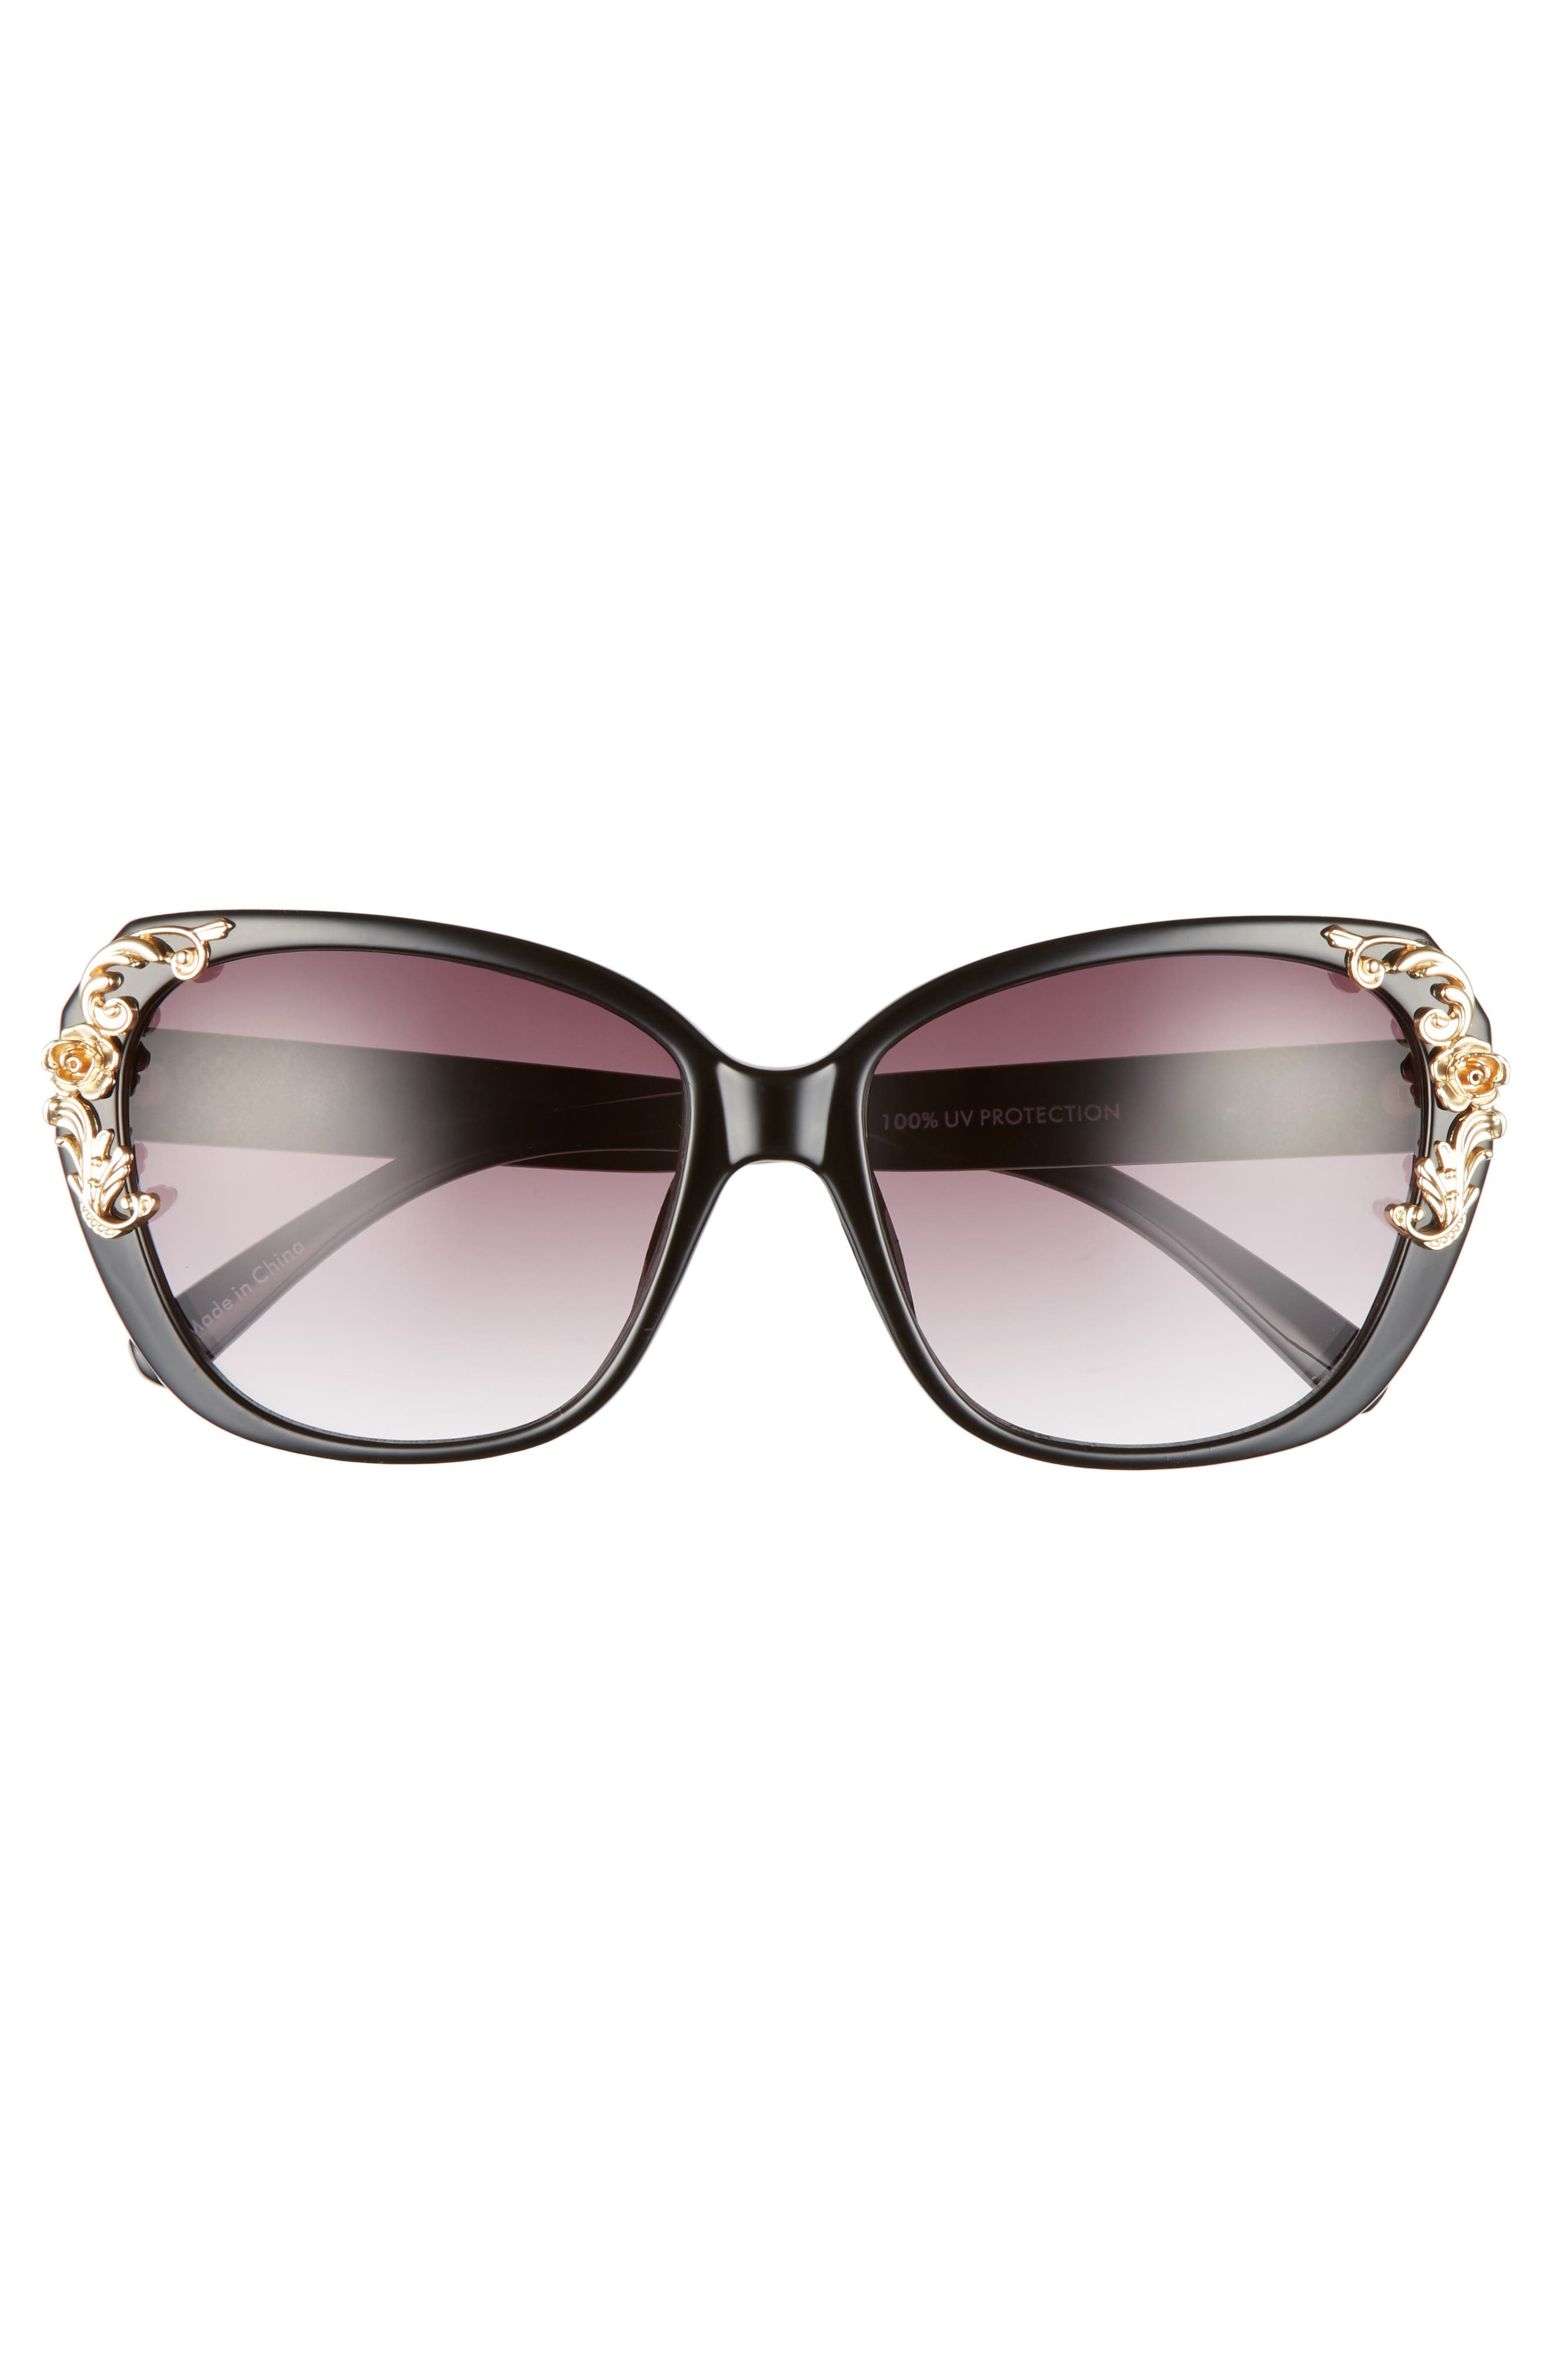 56mm Filigree Embellished Square Sunglasses,                             Alternate thumbnail 3, color,                             005